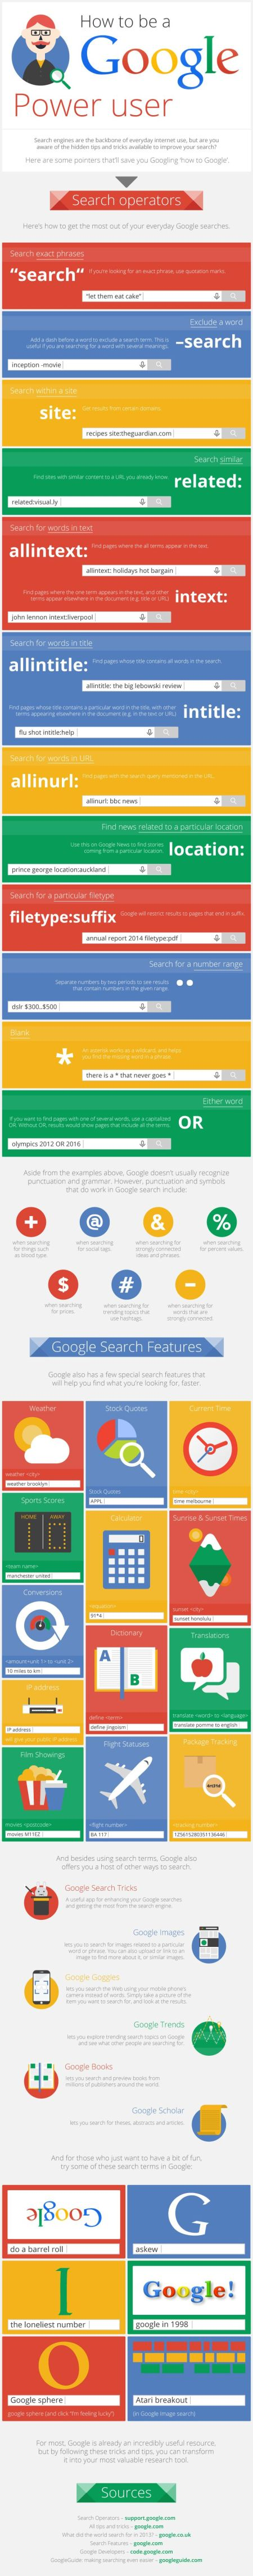 GooglePowerUser